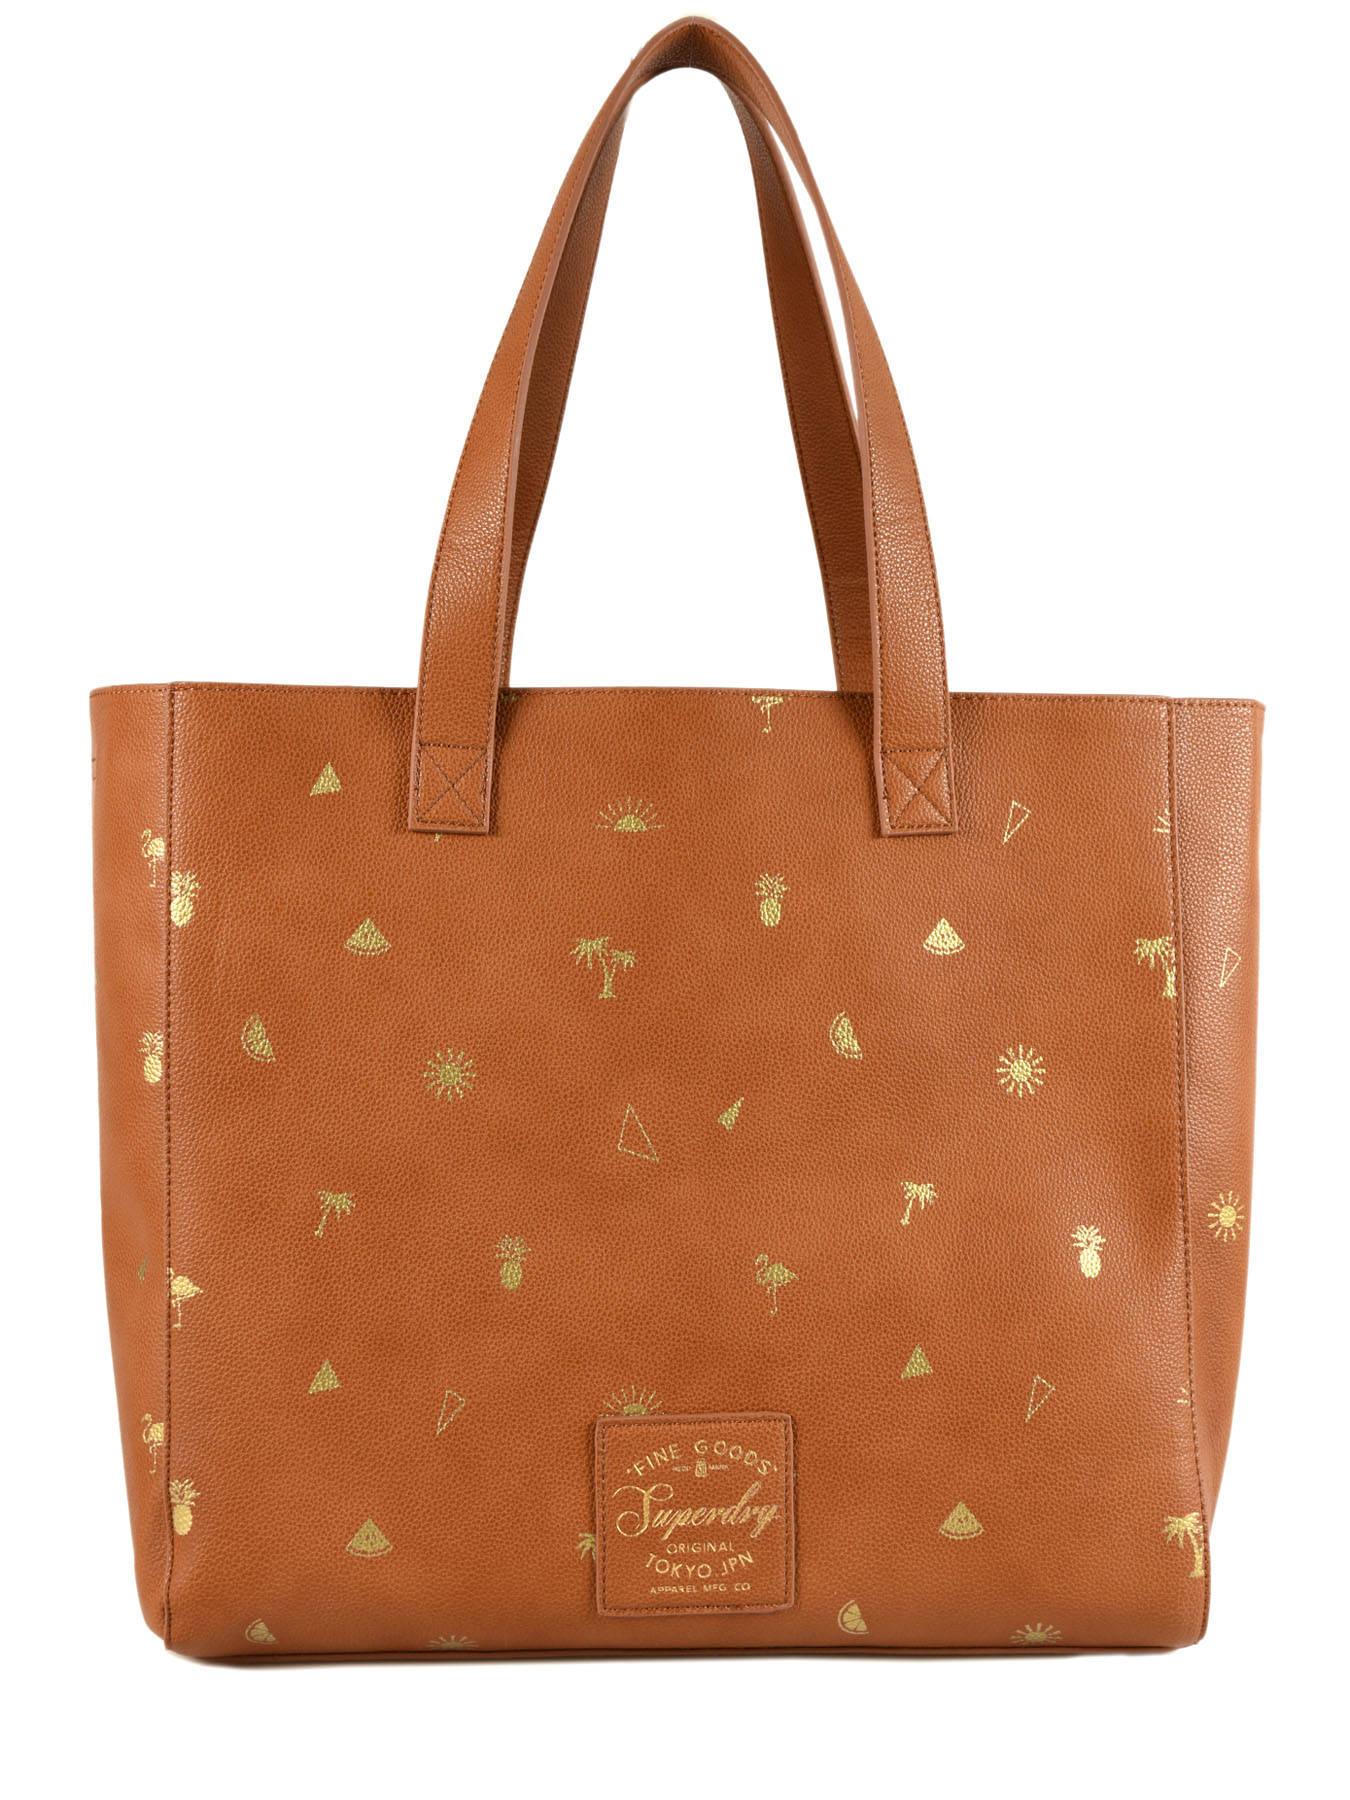 Sac Women women A4 bags Marron Bags Porté épaule Superdry G91003YQ fRRxFPU